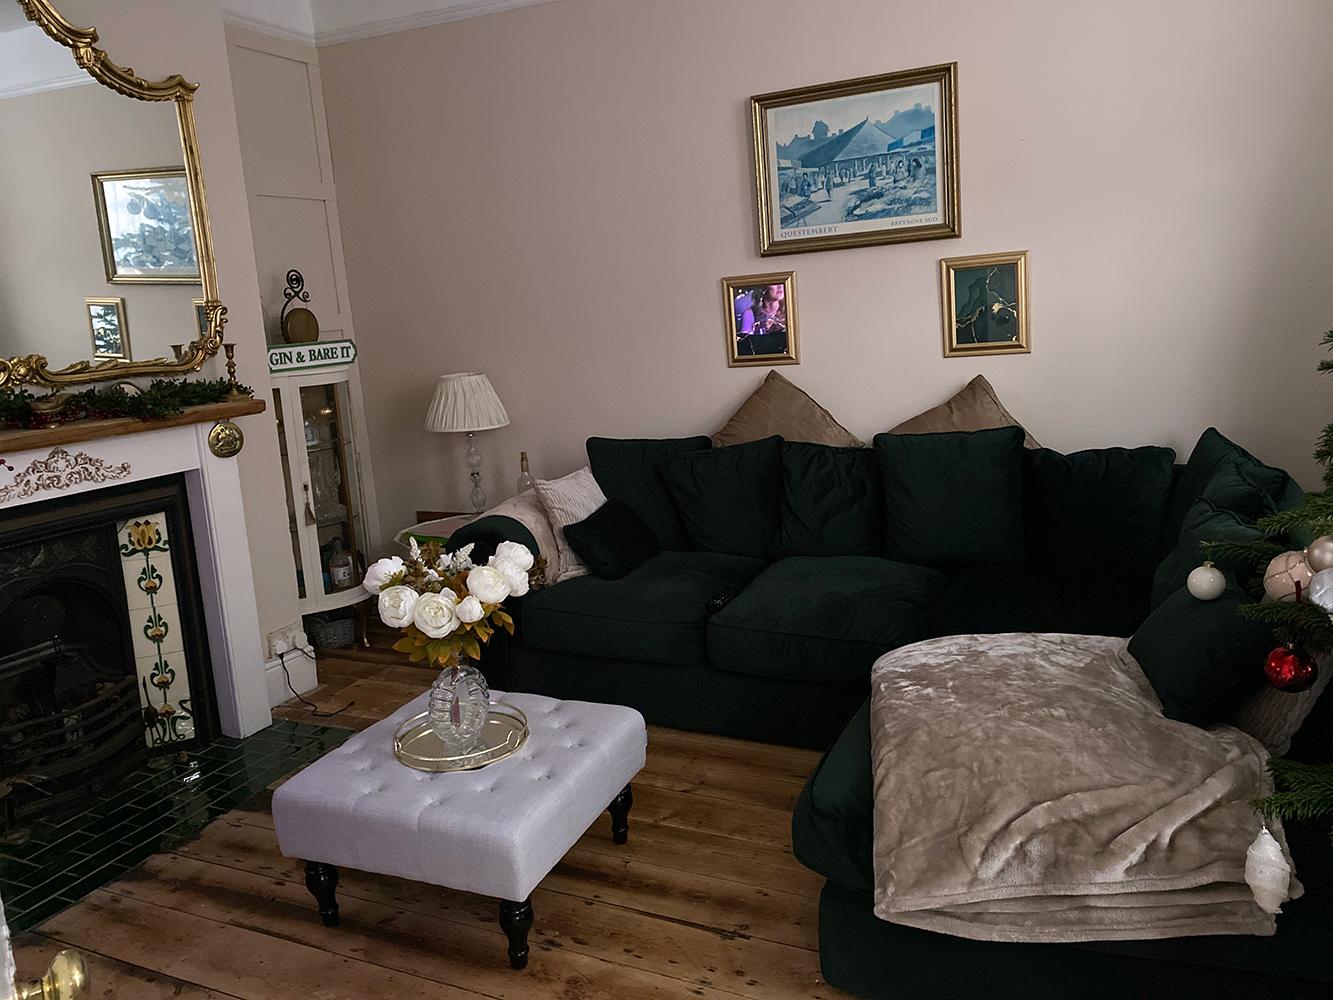 Butelkowy zielona sofa narożna Baron, tkanina welurowa